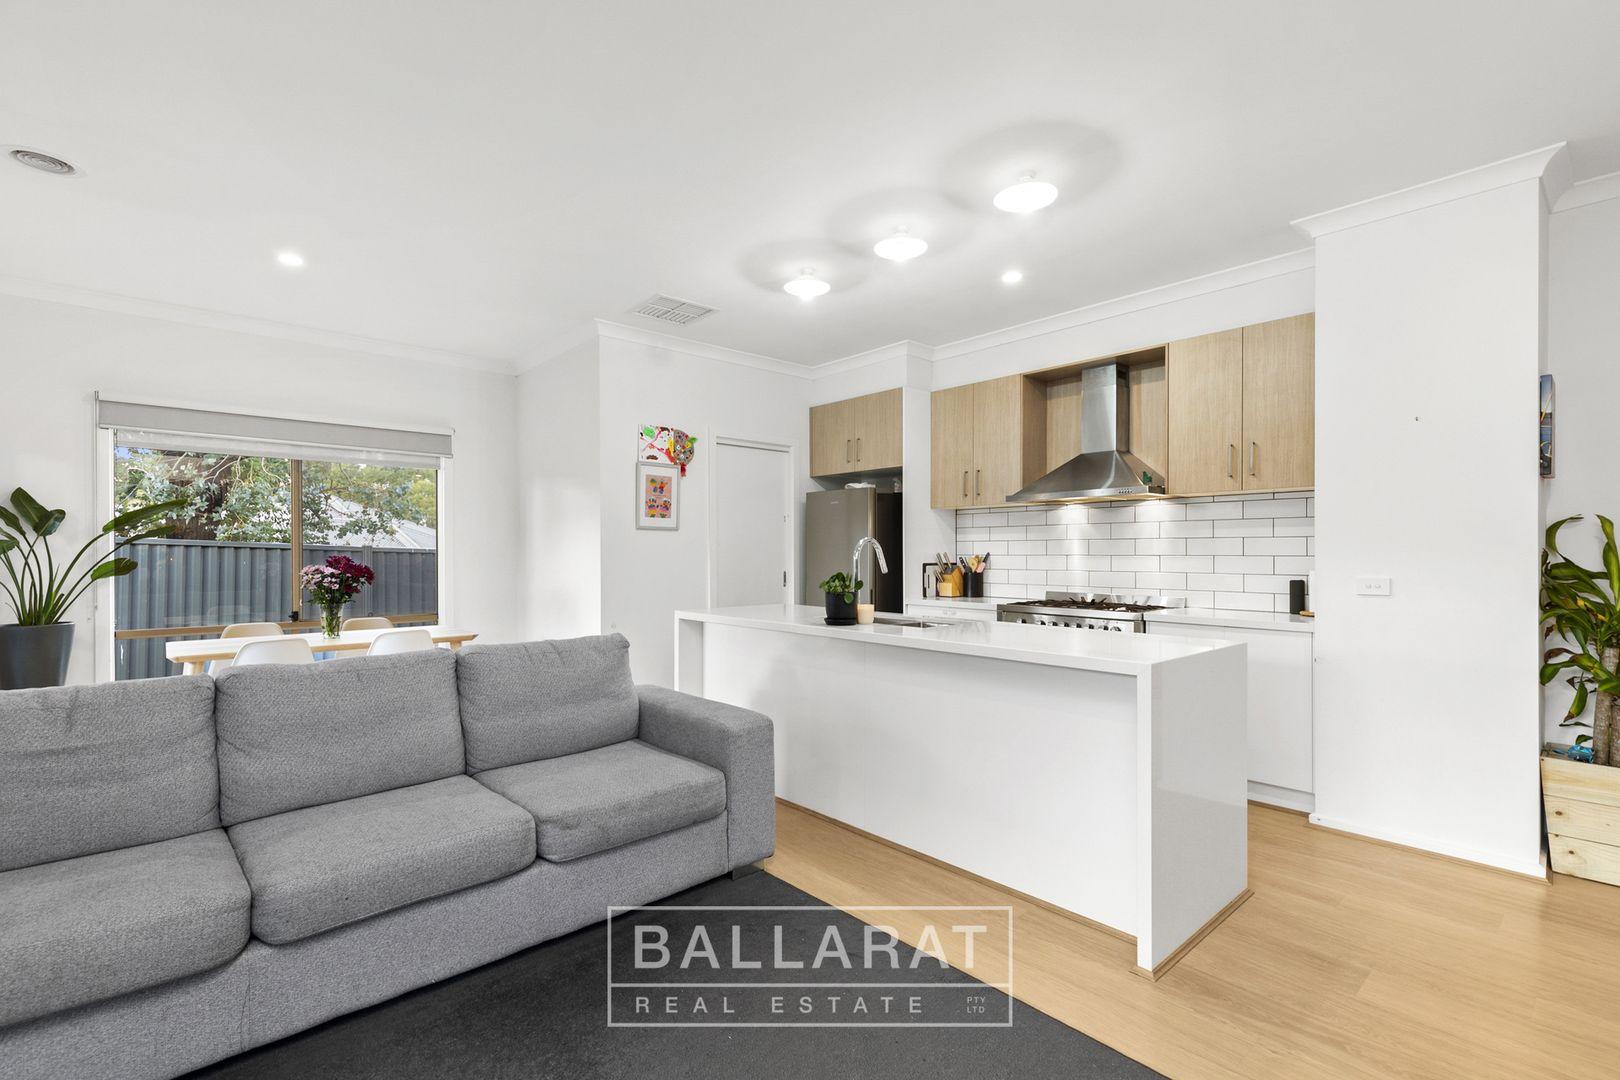 9 Nelmore Court, Ballarat East VIC 3350, Image 2